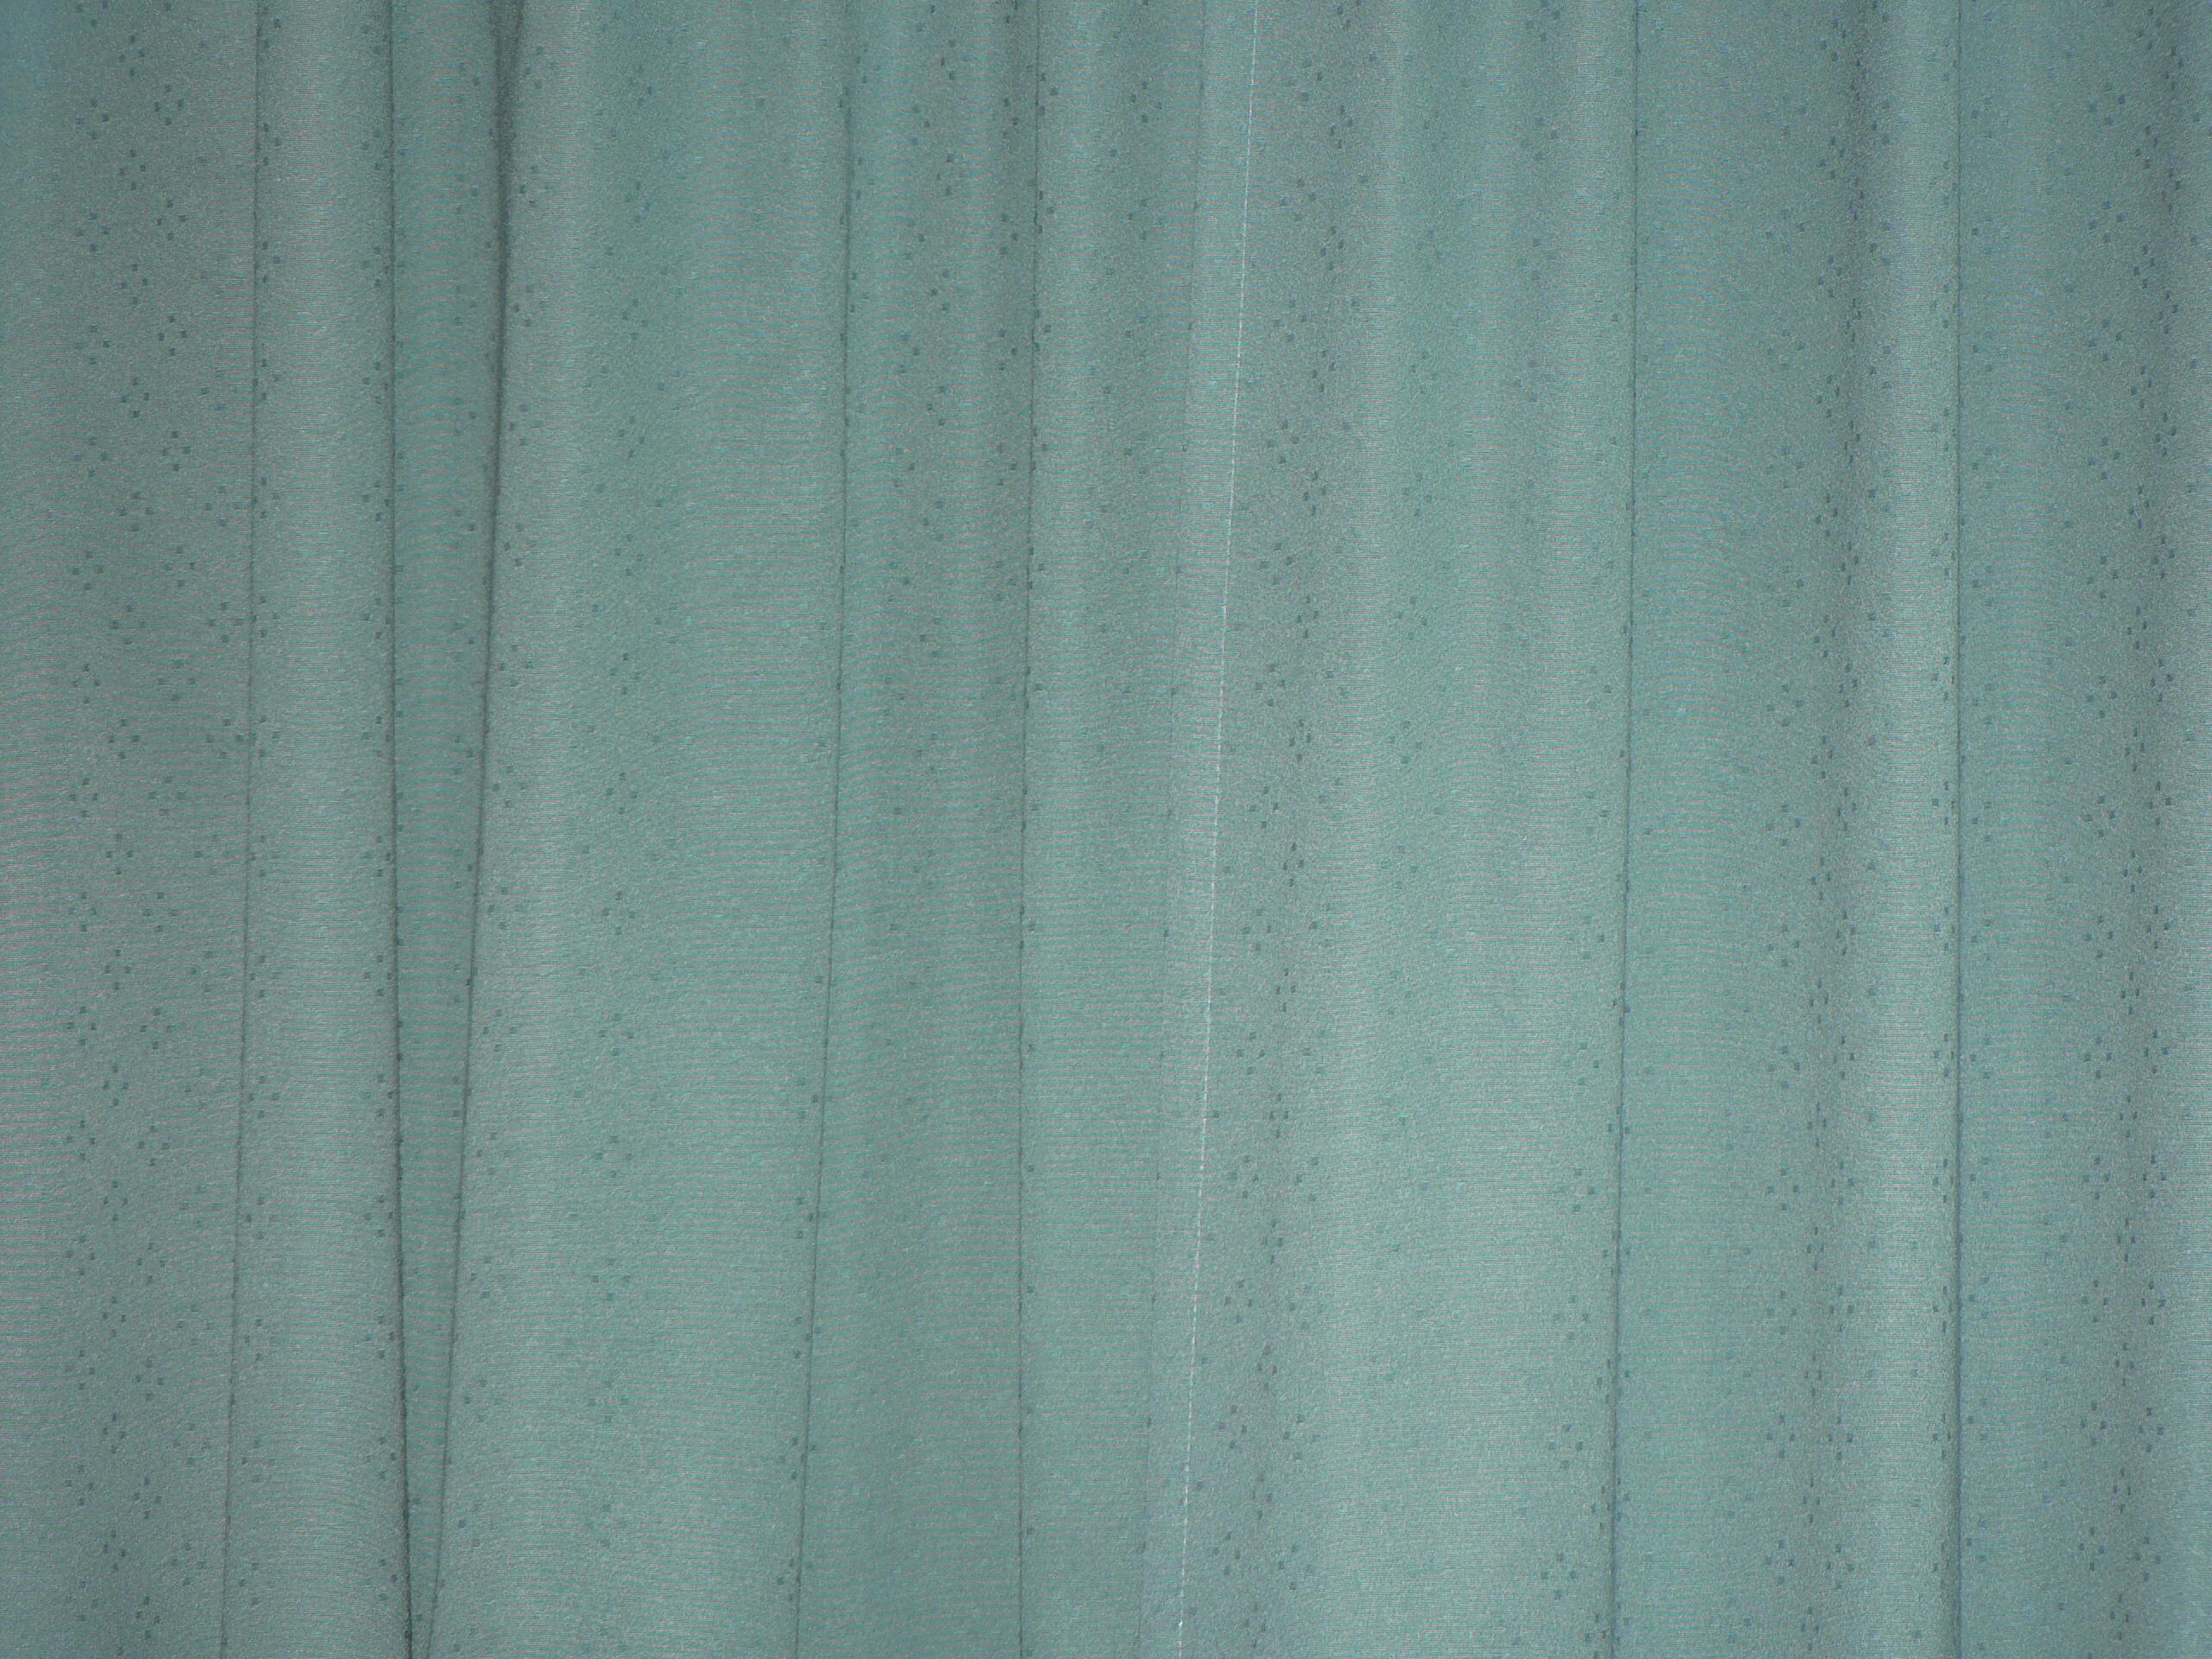 Curtains texture -  Plain Texture 02 By Textures Galore